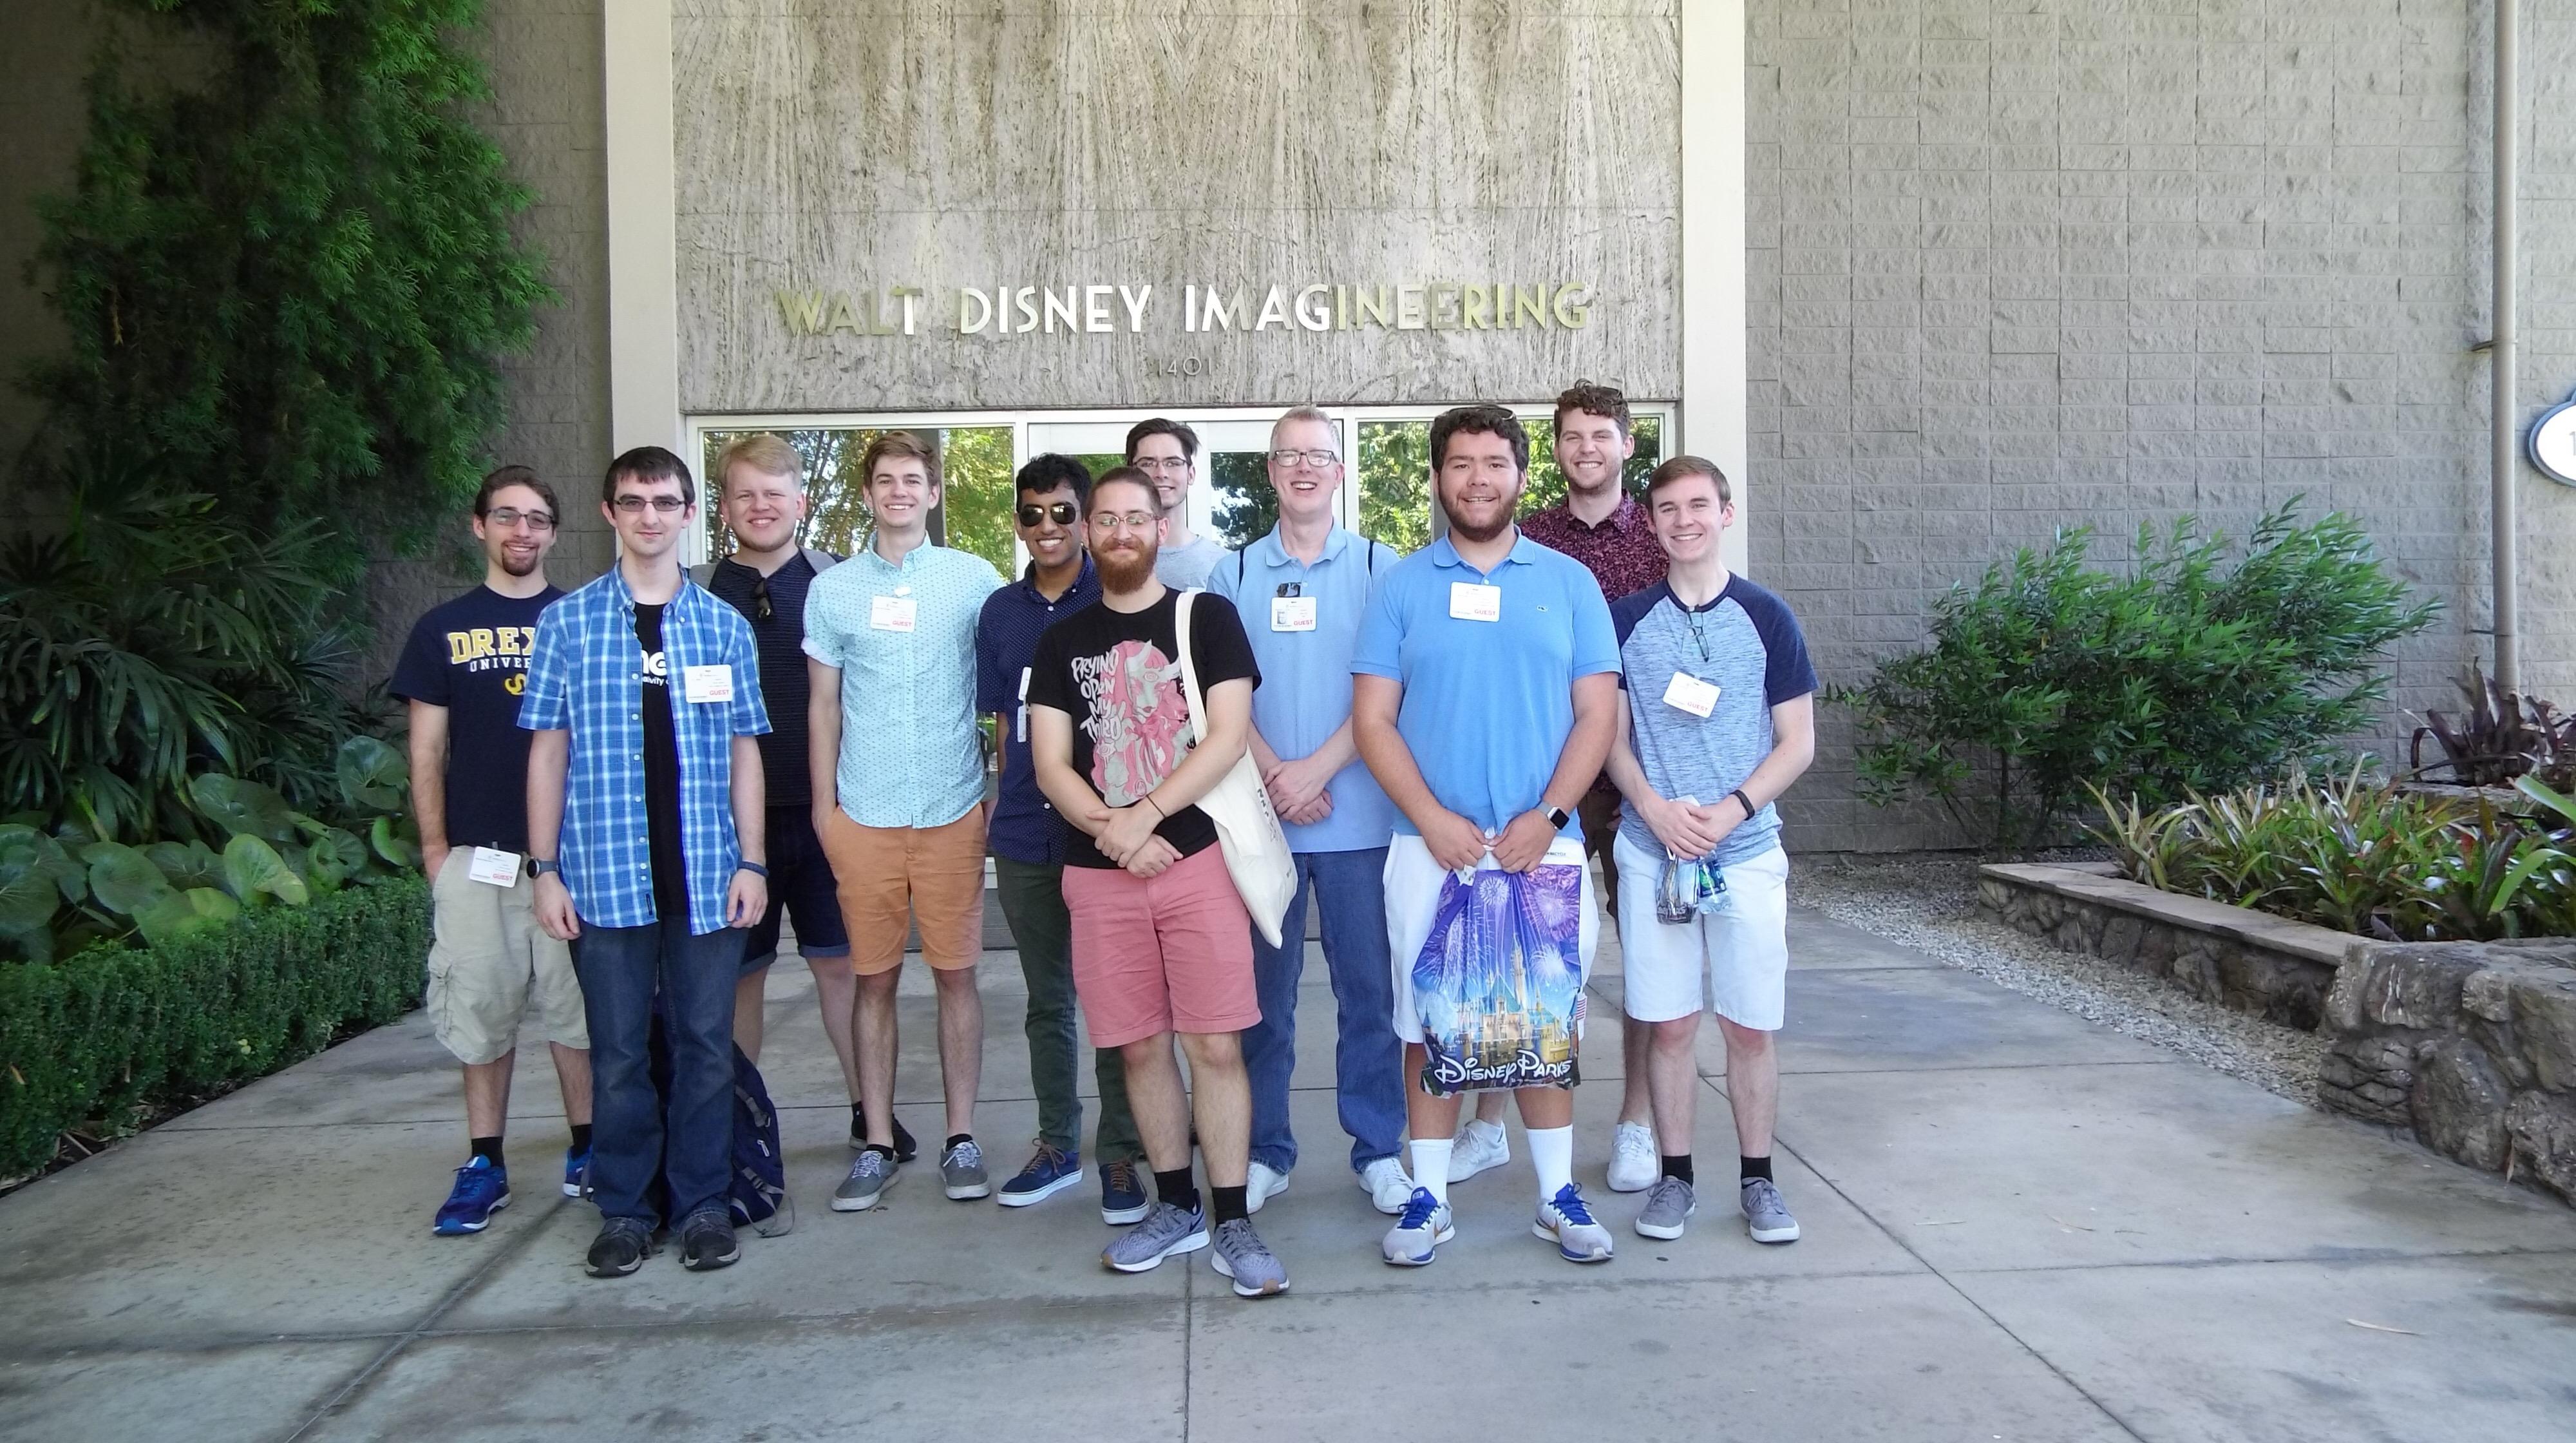 Walt Disney Imagineering Visit 8/19